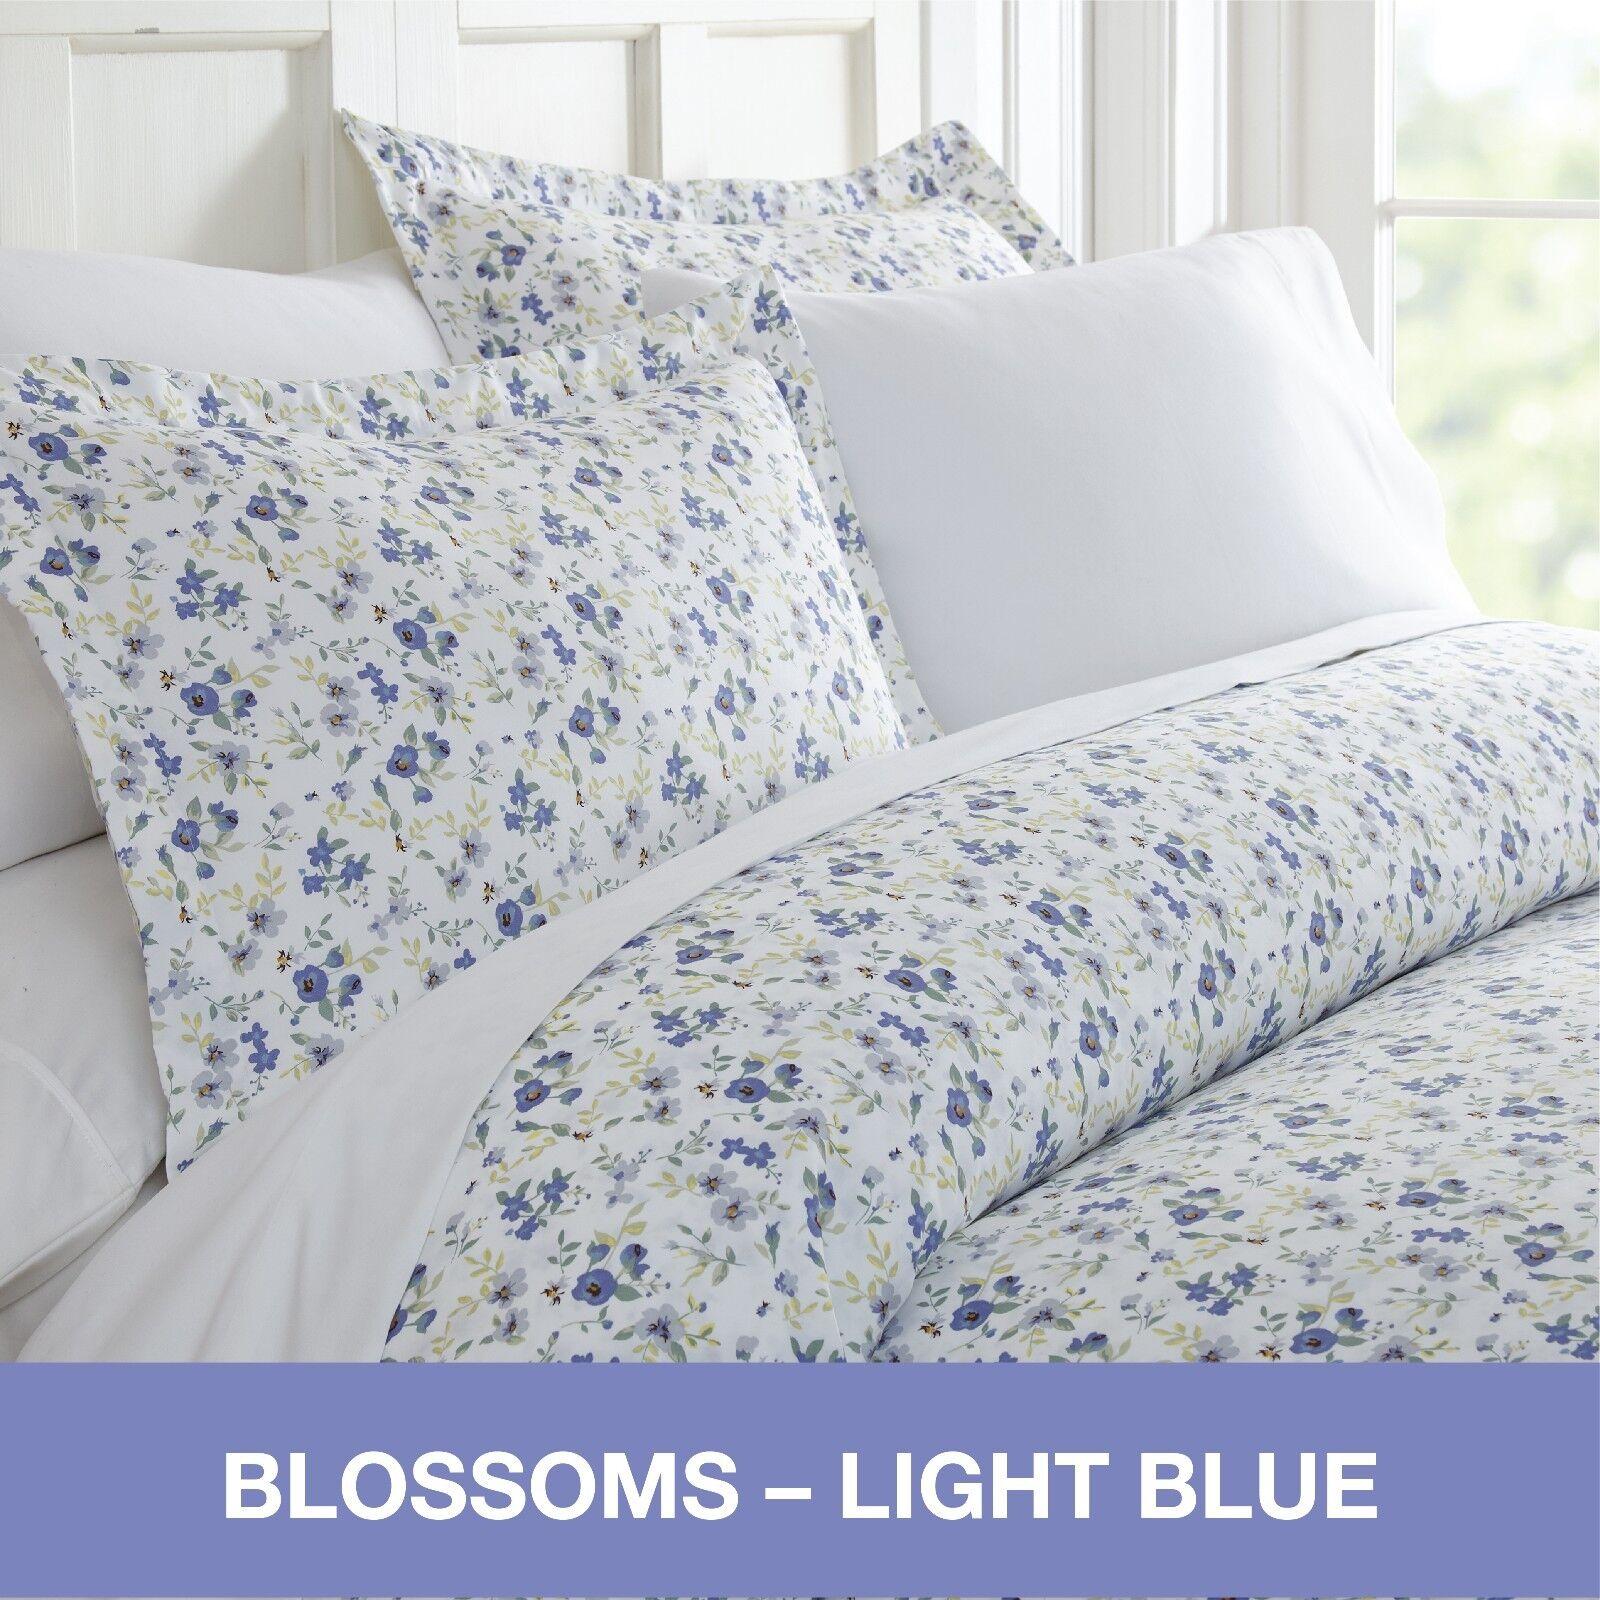 Hotel Collection Premium Ultra Soft 3 Piece Blossoms Print Duvet Cover Set